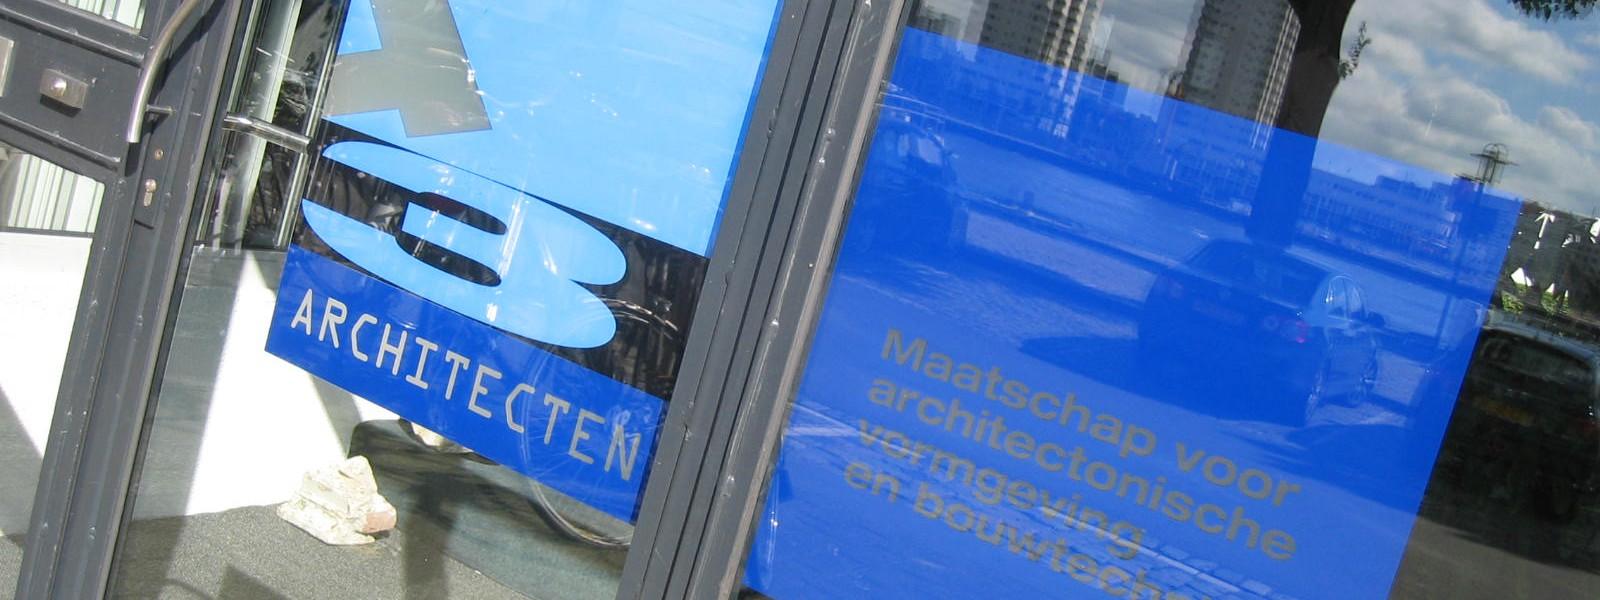 A3 Architecten Rotterdam